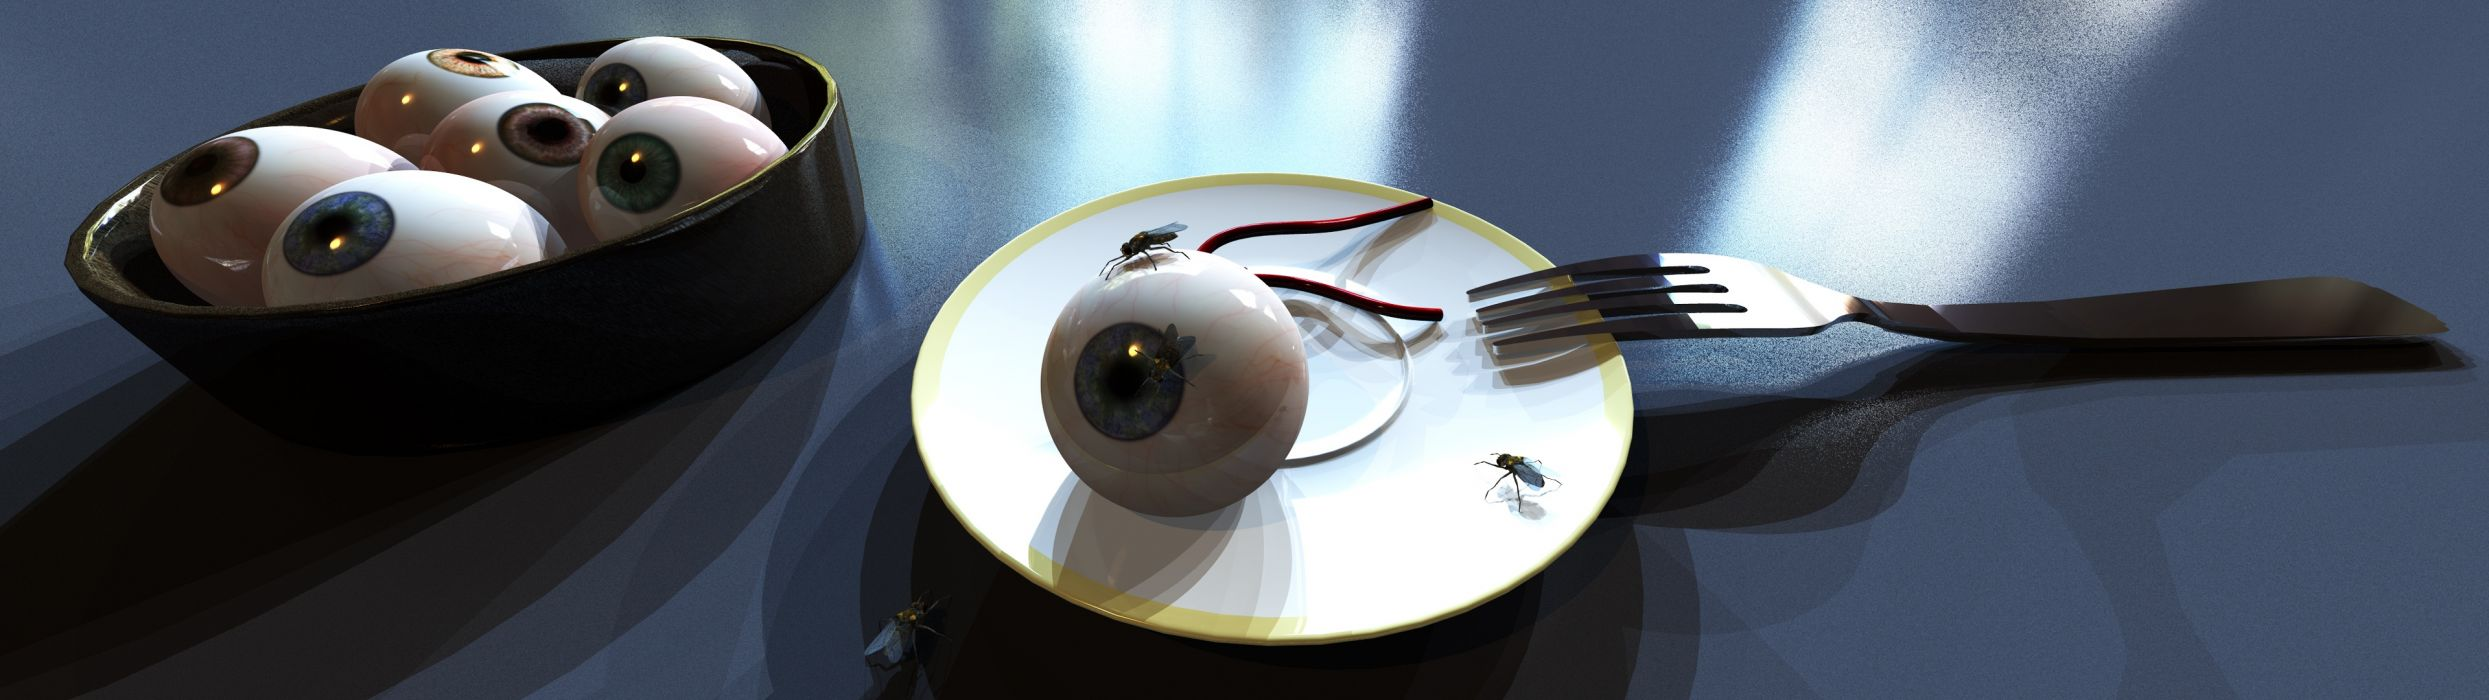 Fresh eye on dish (3840x1080) wallpaper